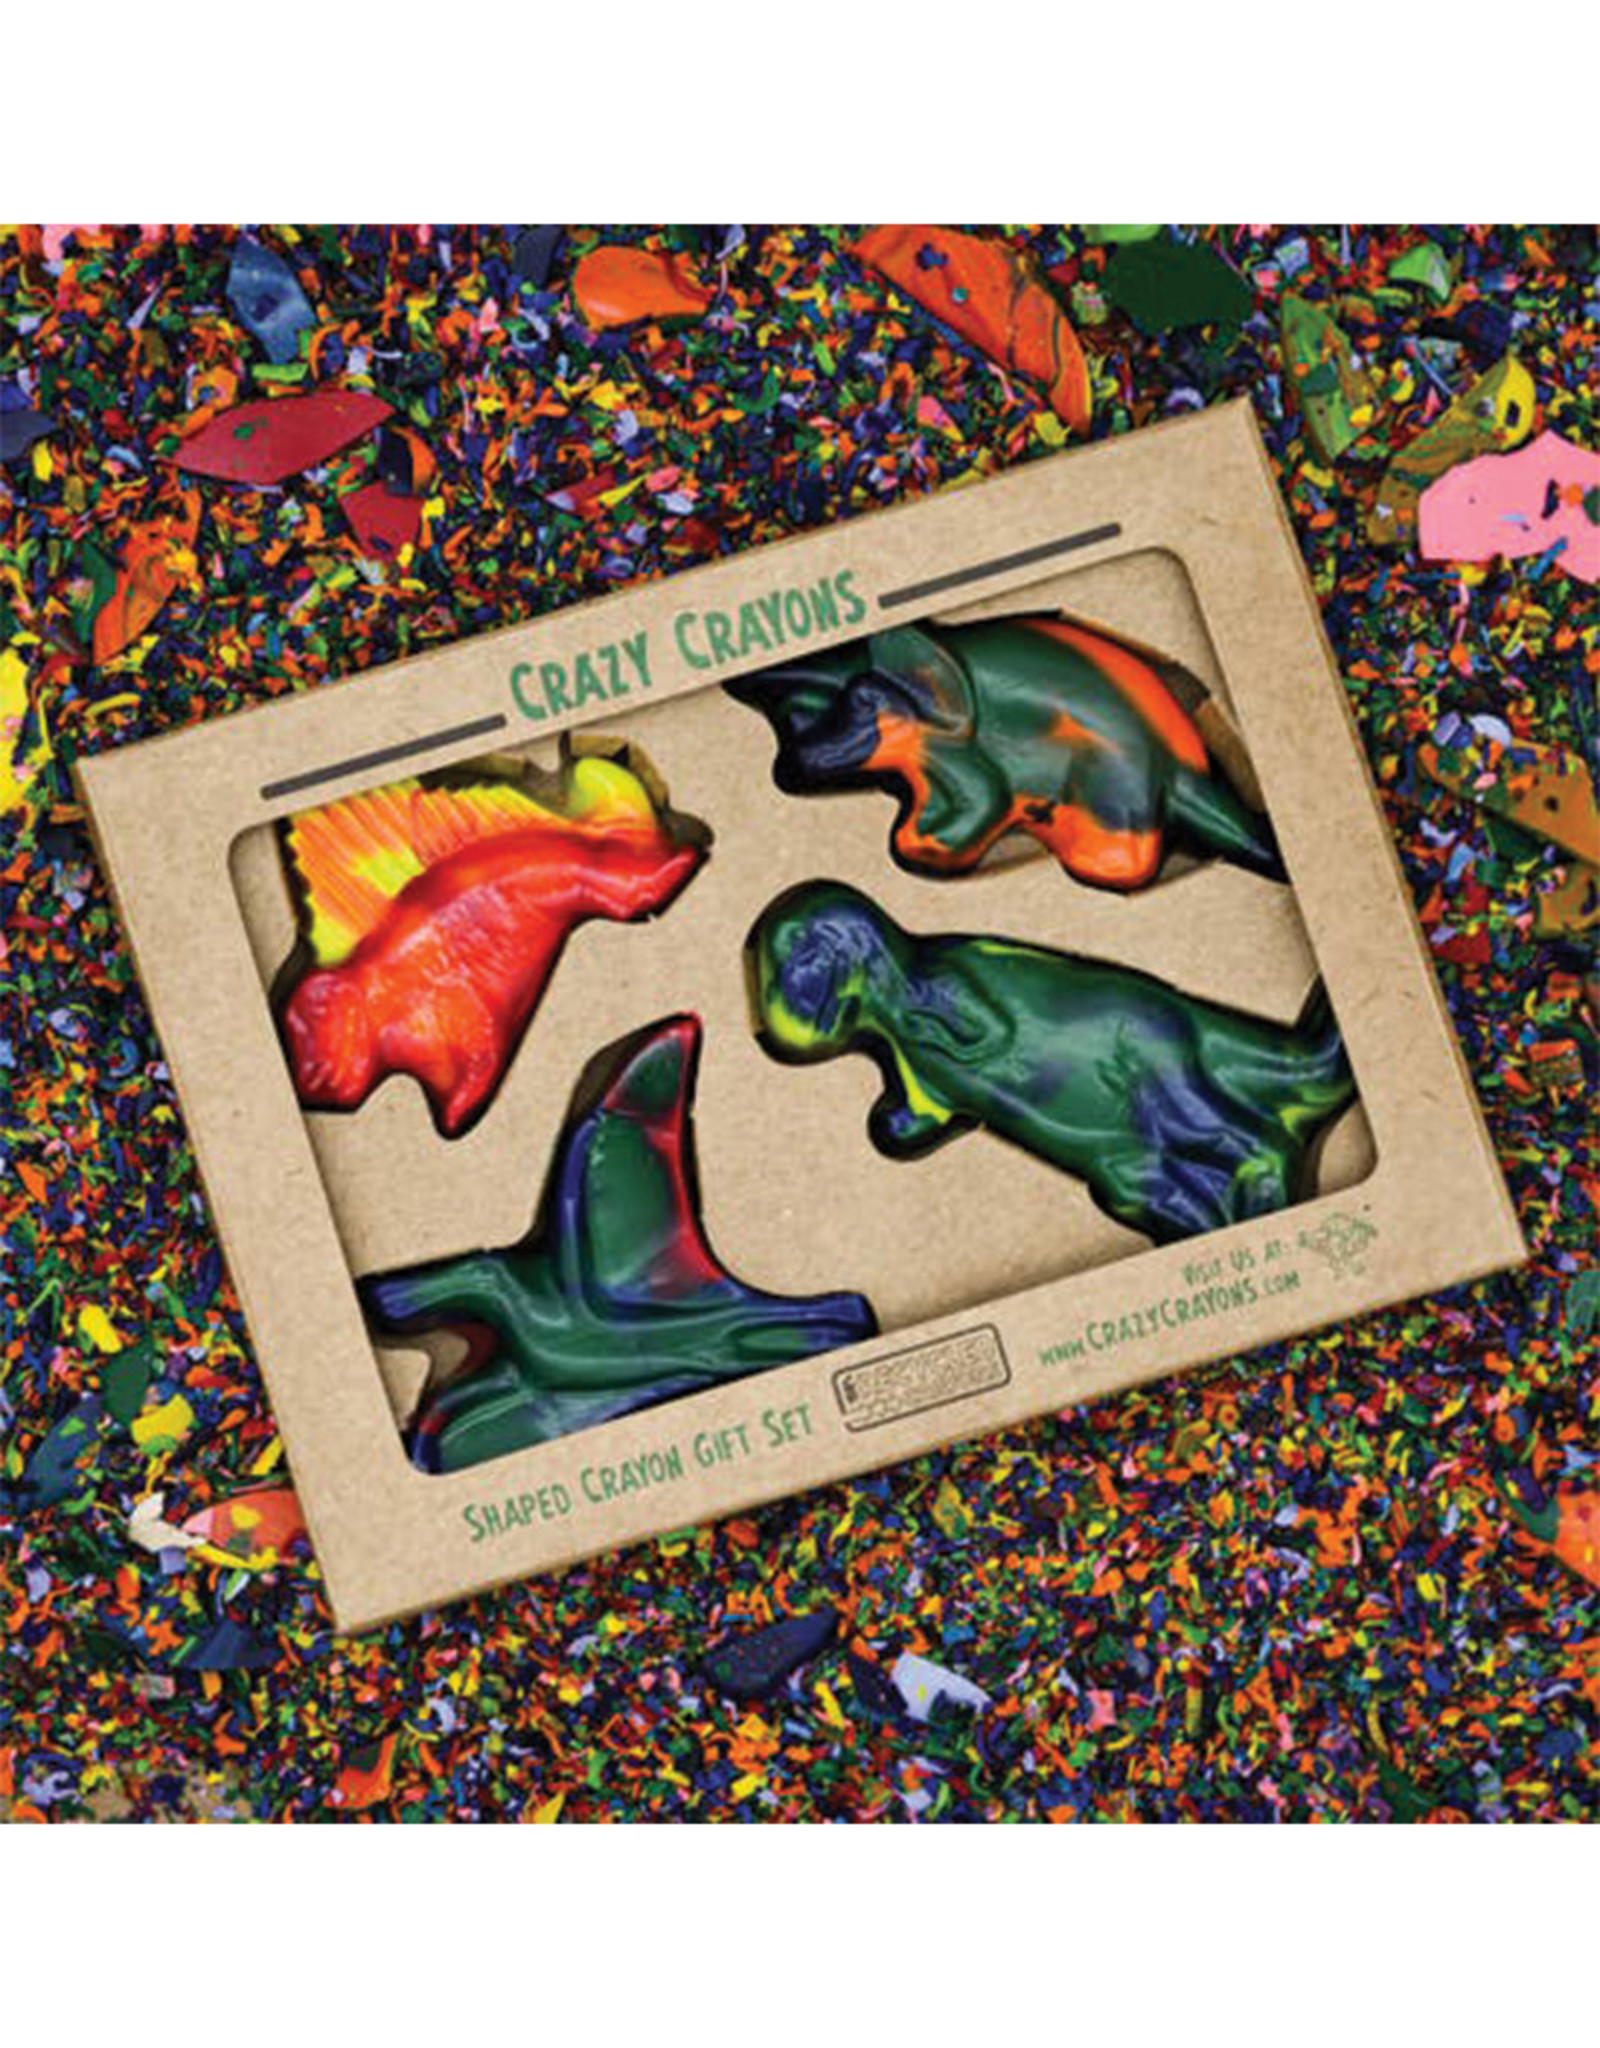 Crazy Crayons Dinosaur Recycled Crayons